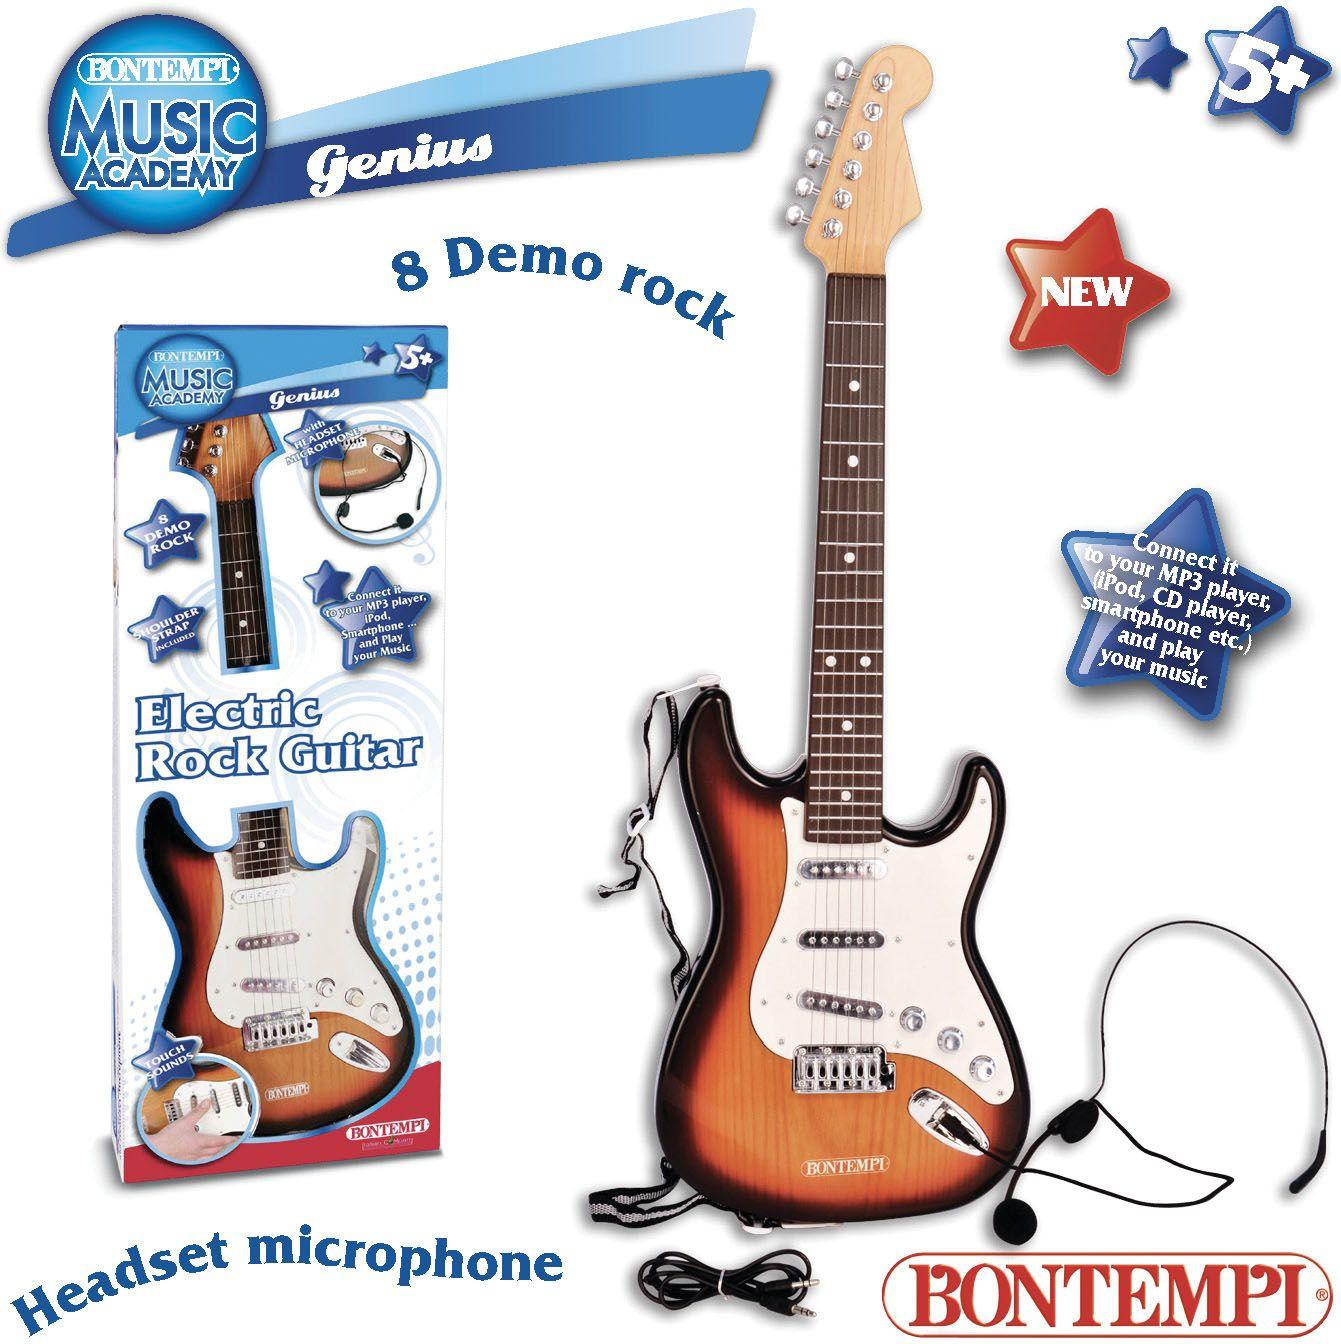 Bontempi Gitara elektroniczna - zestaw GXP-619570